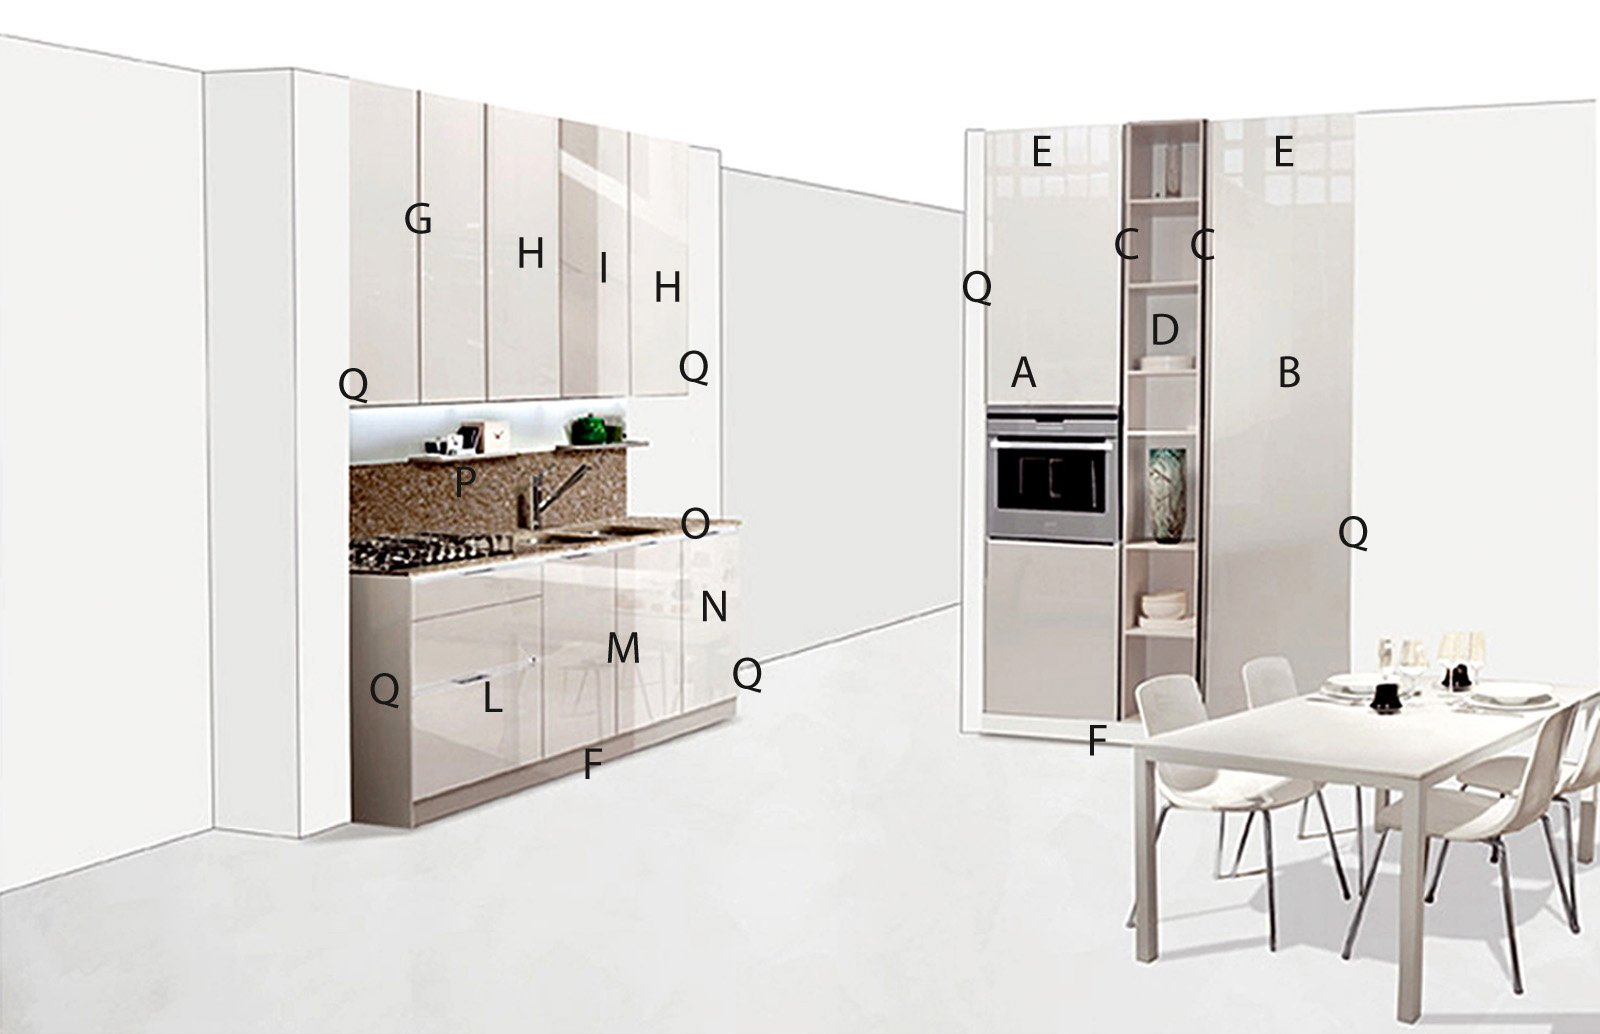 Misure standard mobili cucina. excellent cucina angolare misure